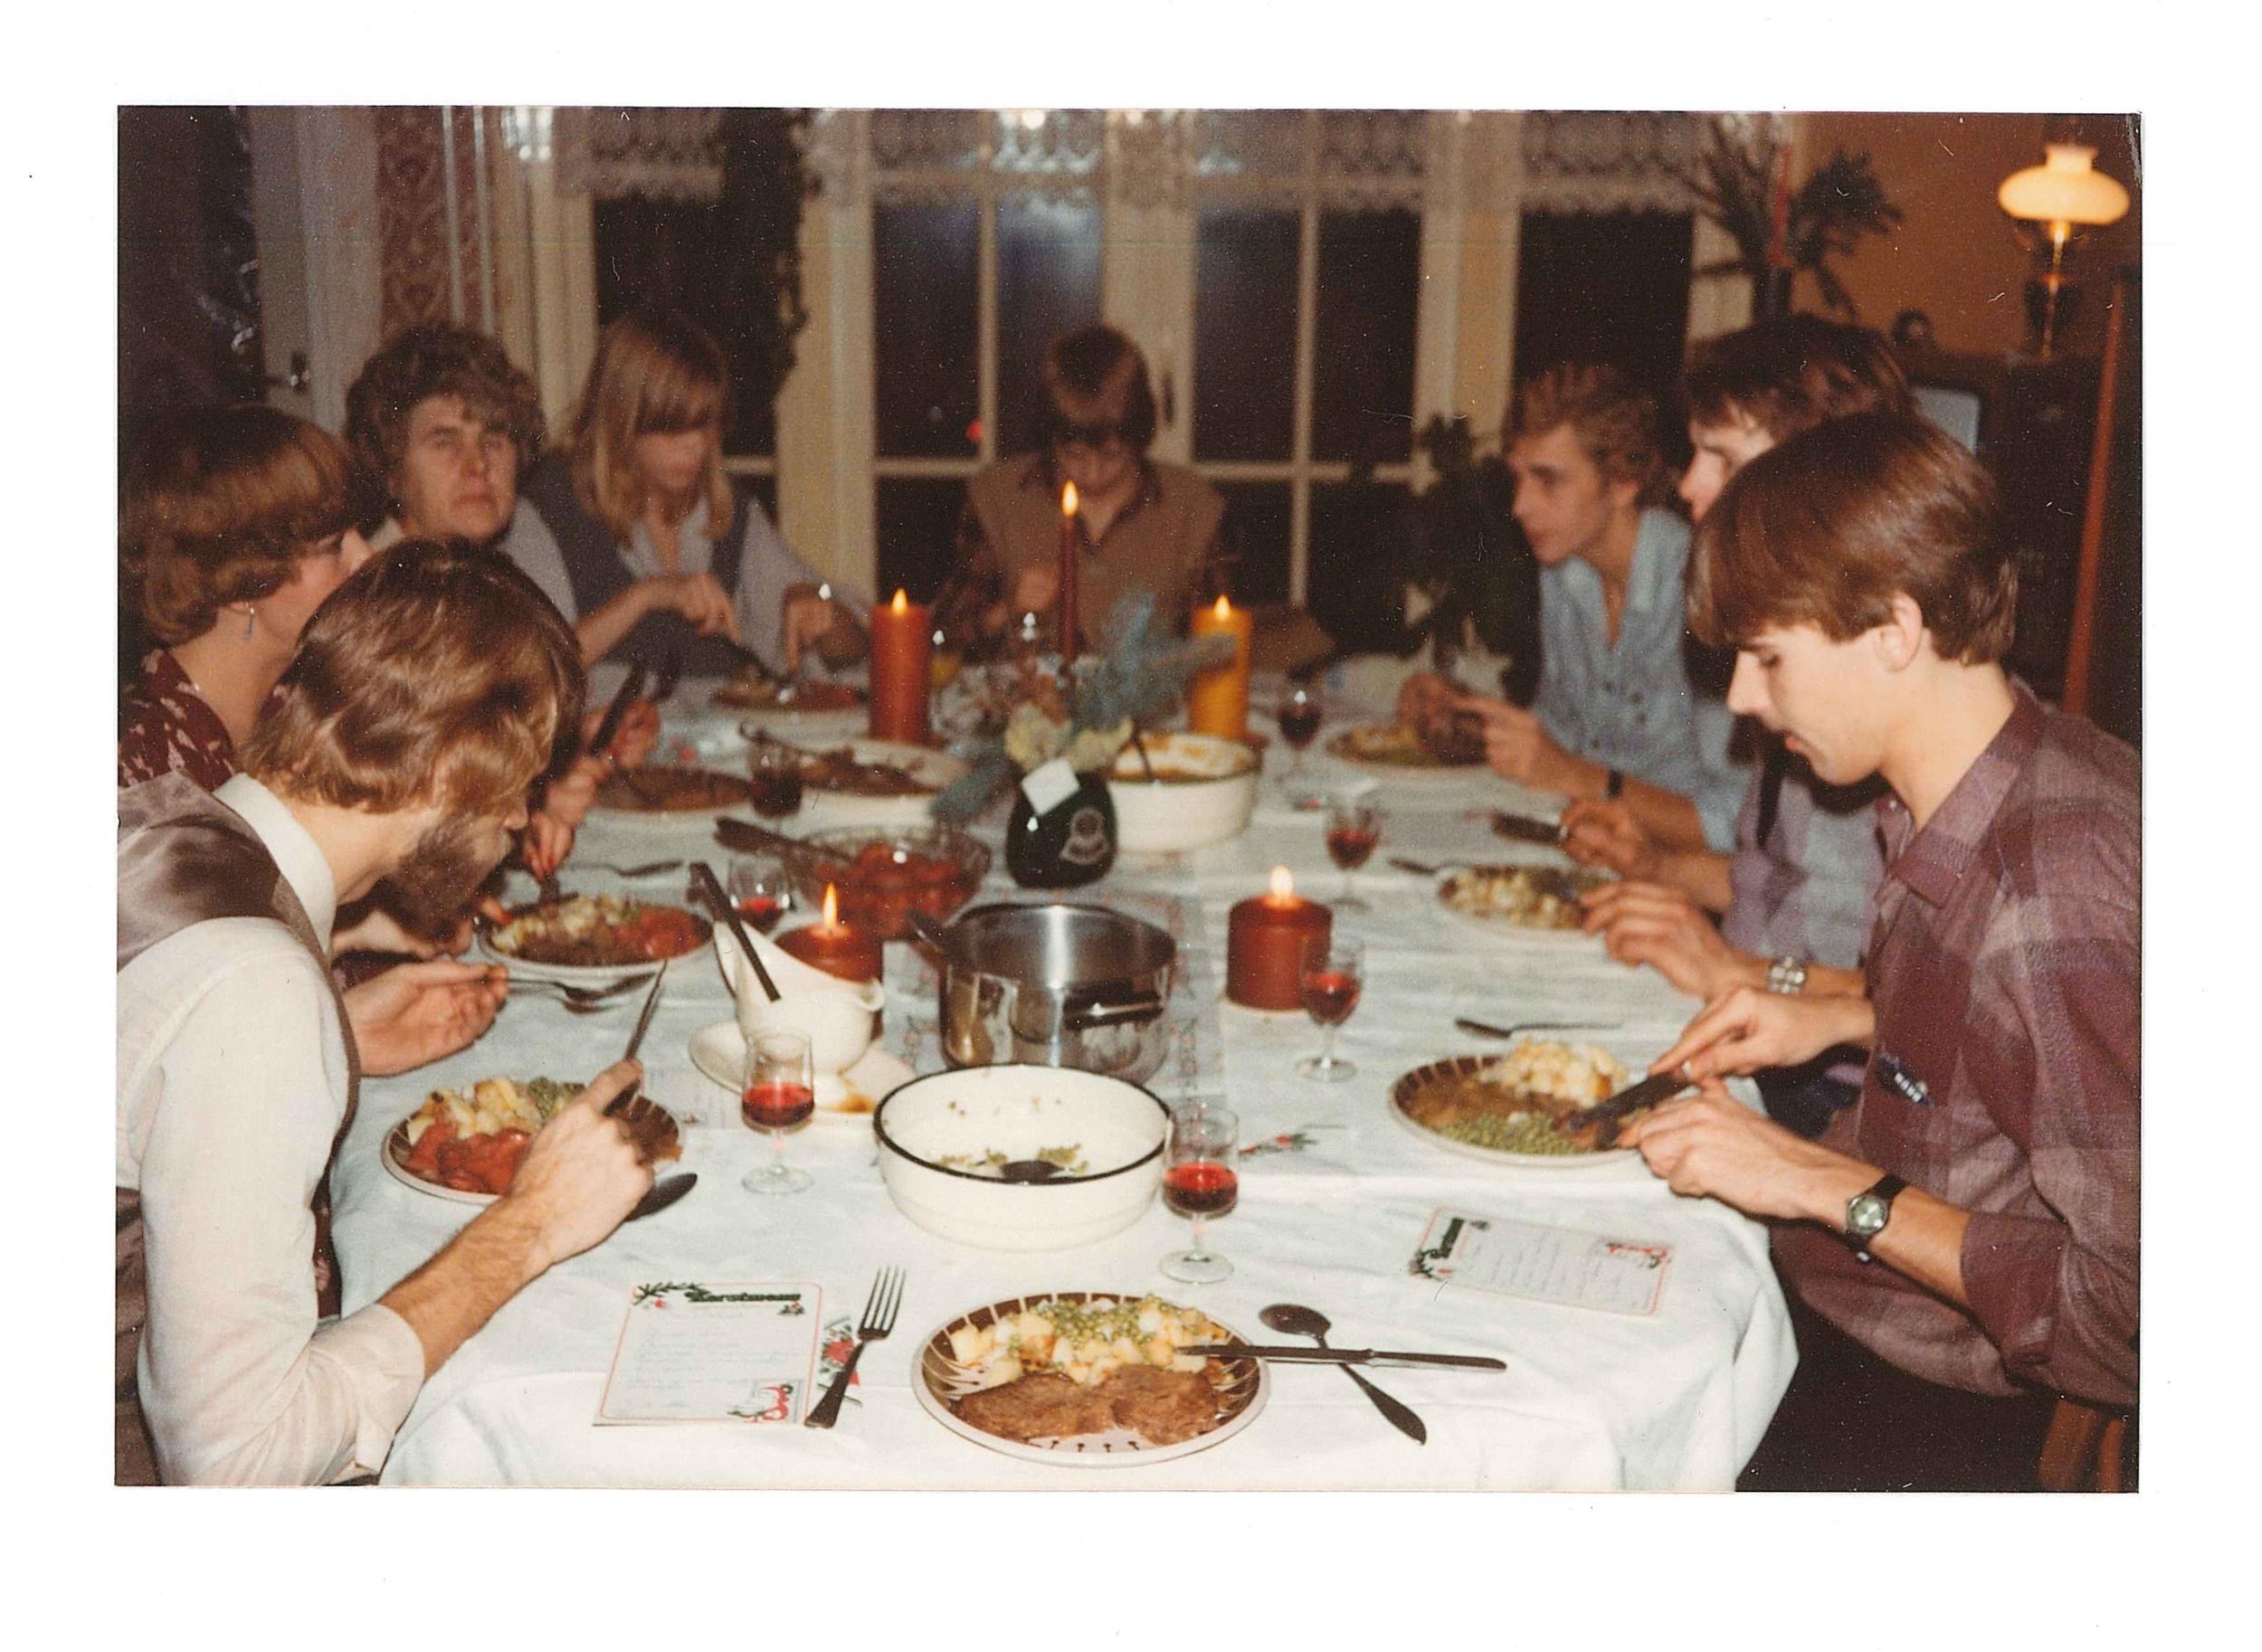 Familie Rietbroek 1978